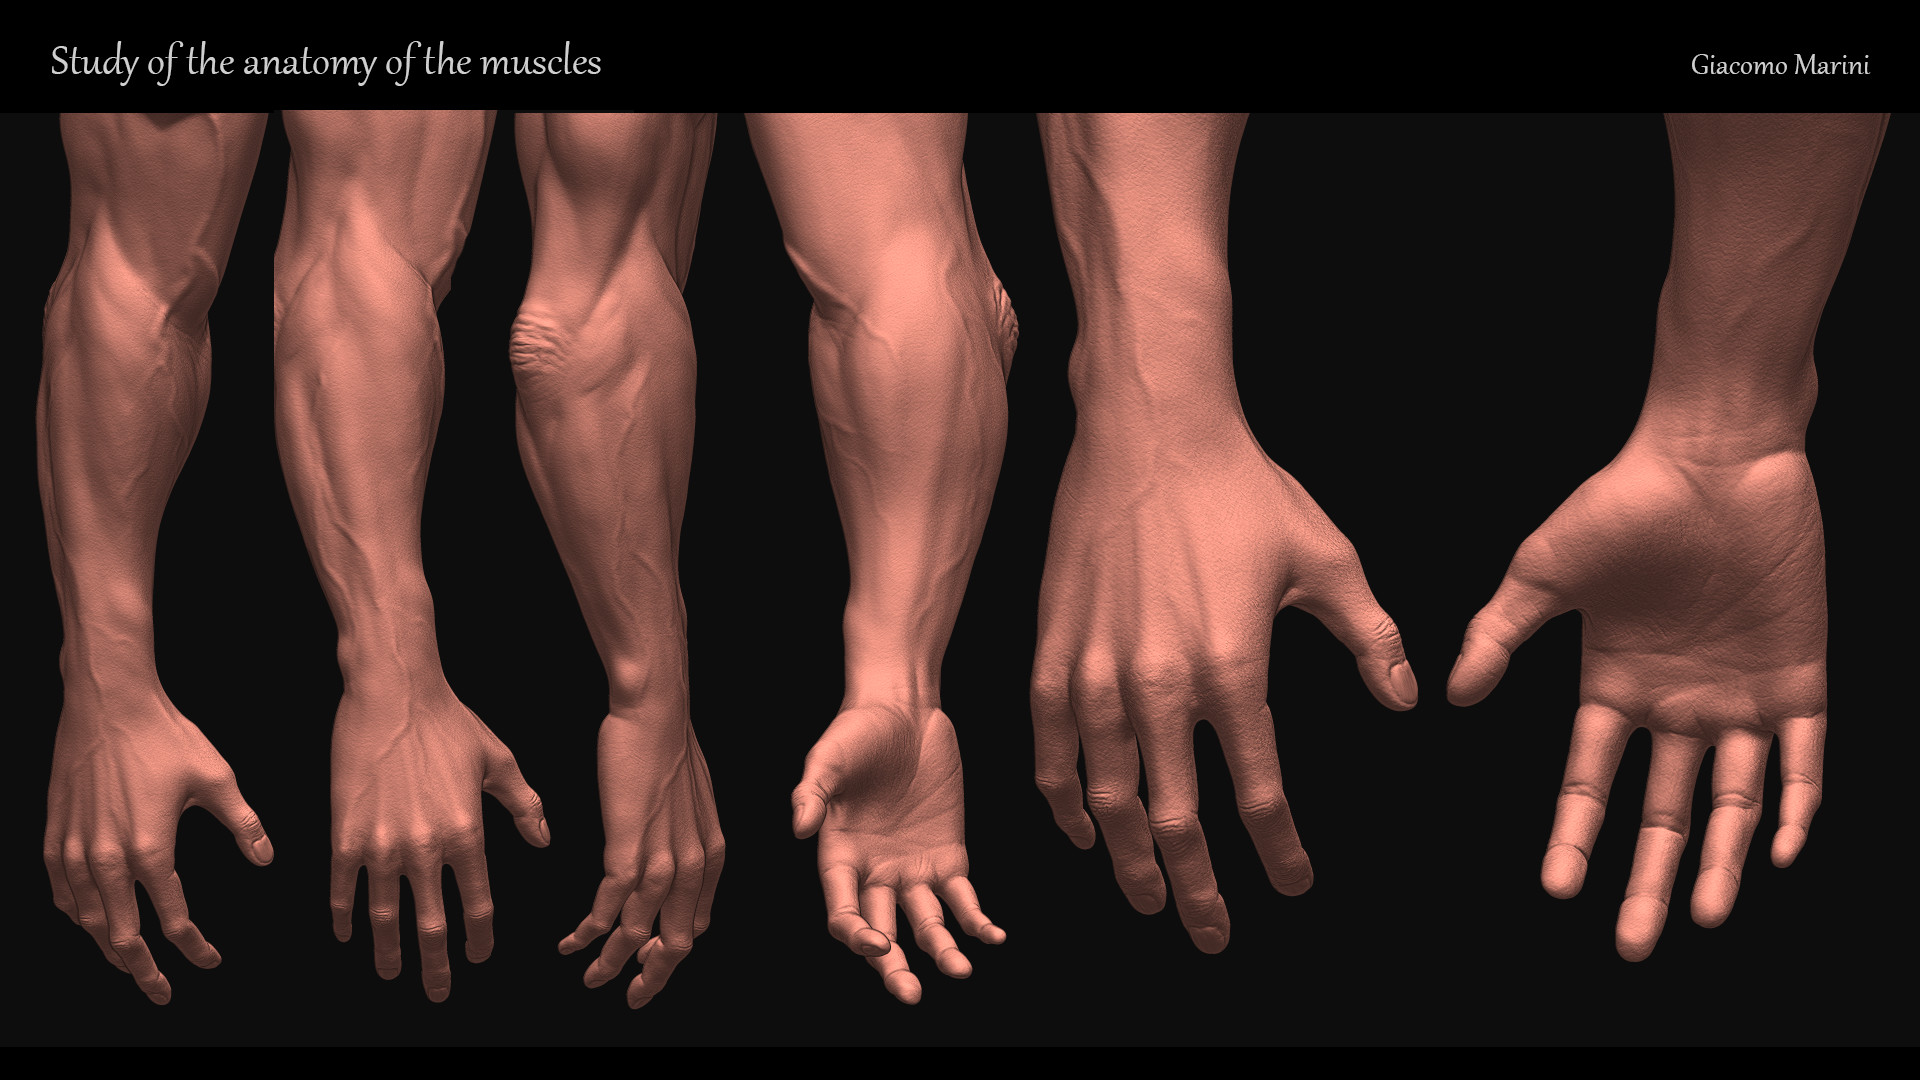 ArtStation - study of the anatomy of the muscles, Giacomo Marini